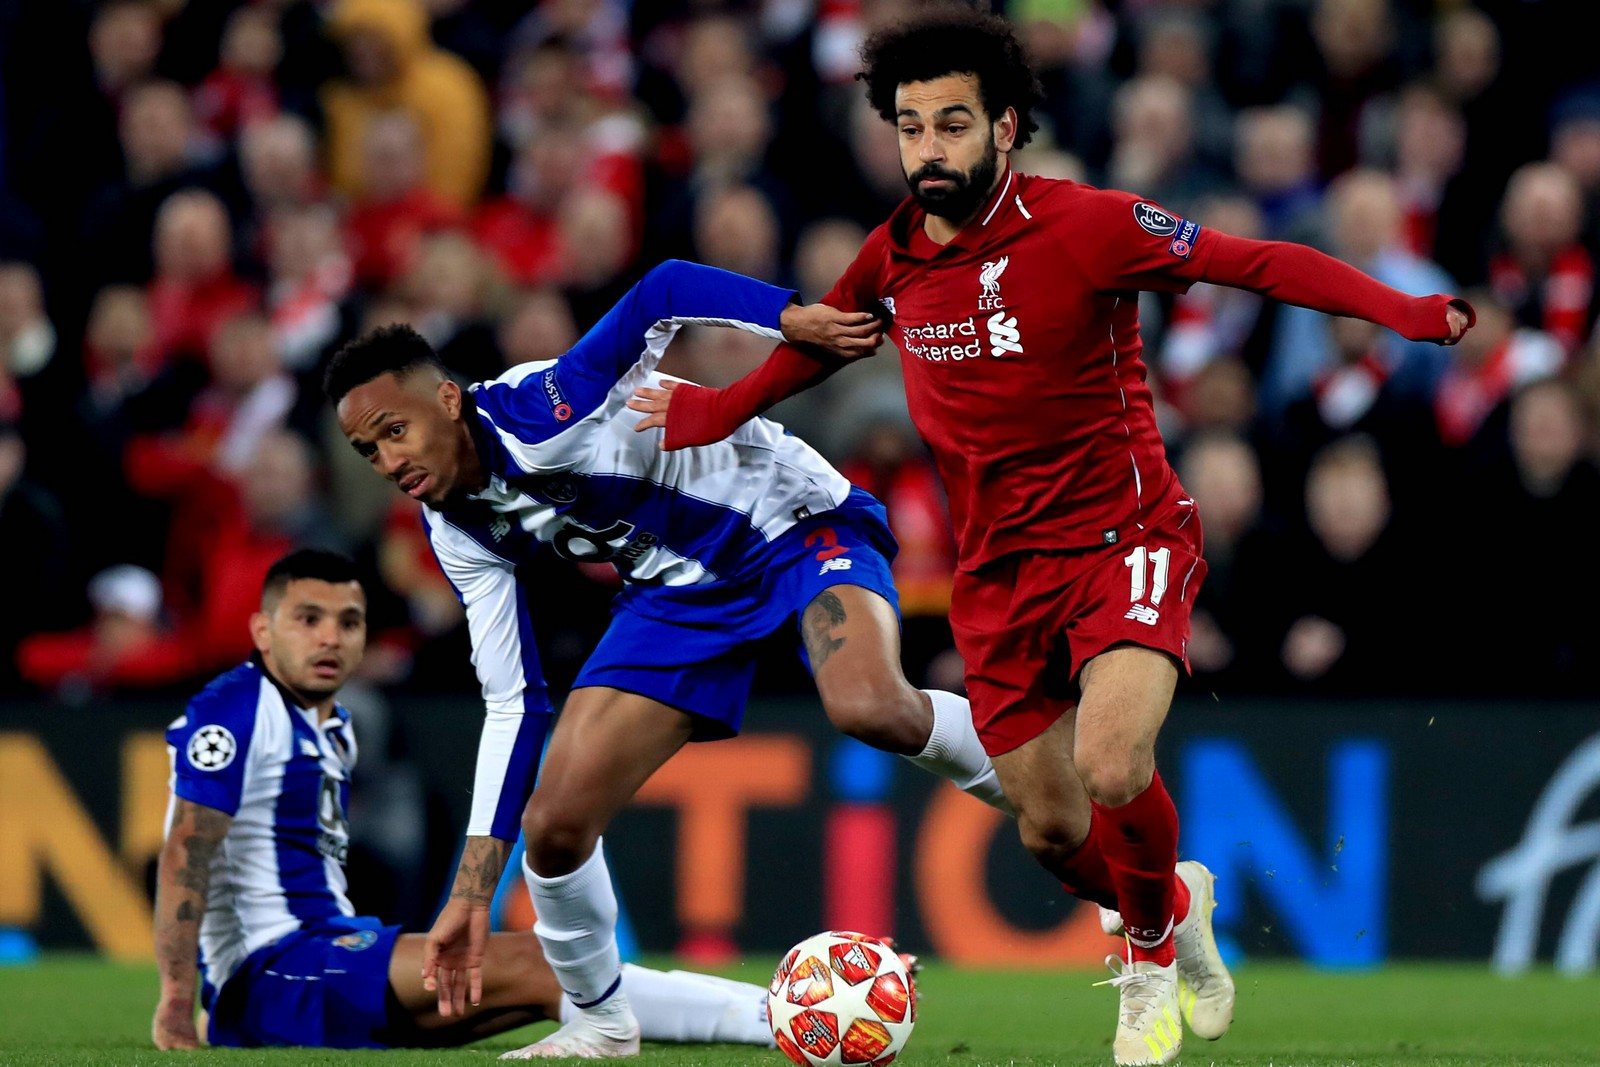 Schießt Mo Salah Liverpool ins Halbfinale? Jetzt auf Porto vs Liverpool wetten!